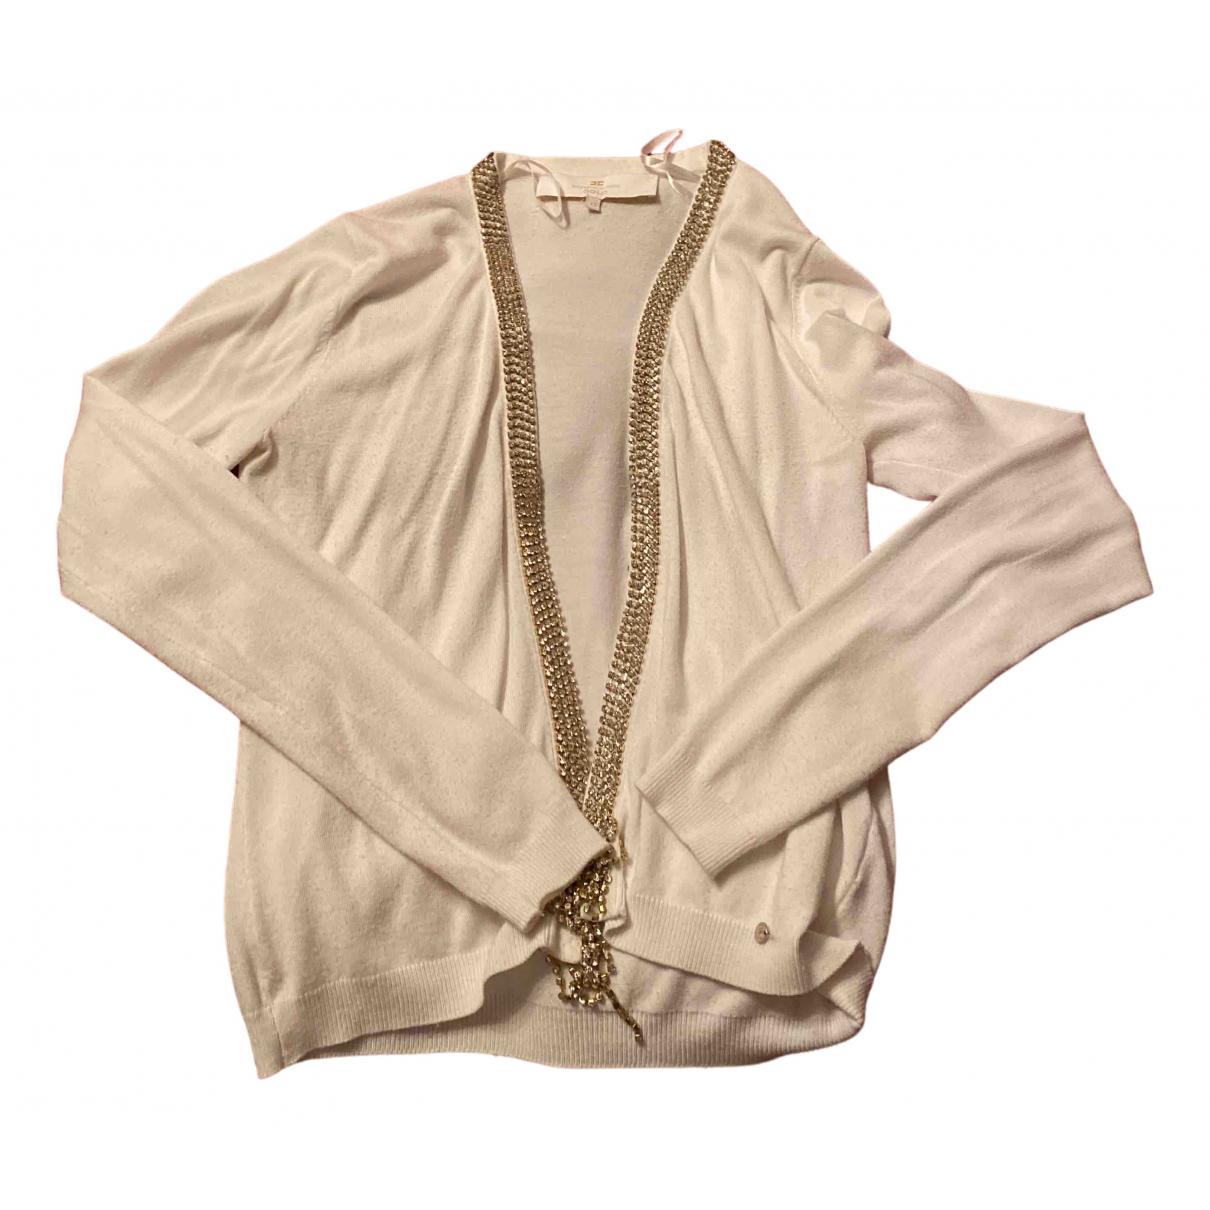 Elisabetta Franchi N White Cotton Knitwear for Women 42 IT